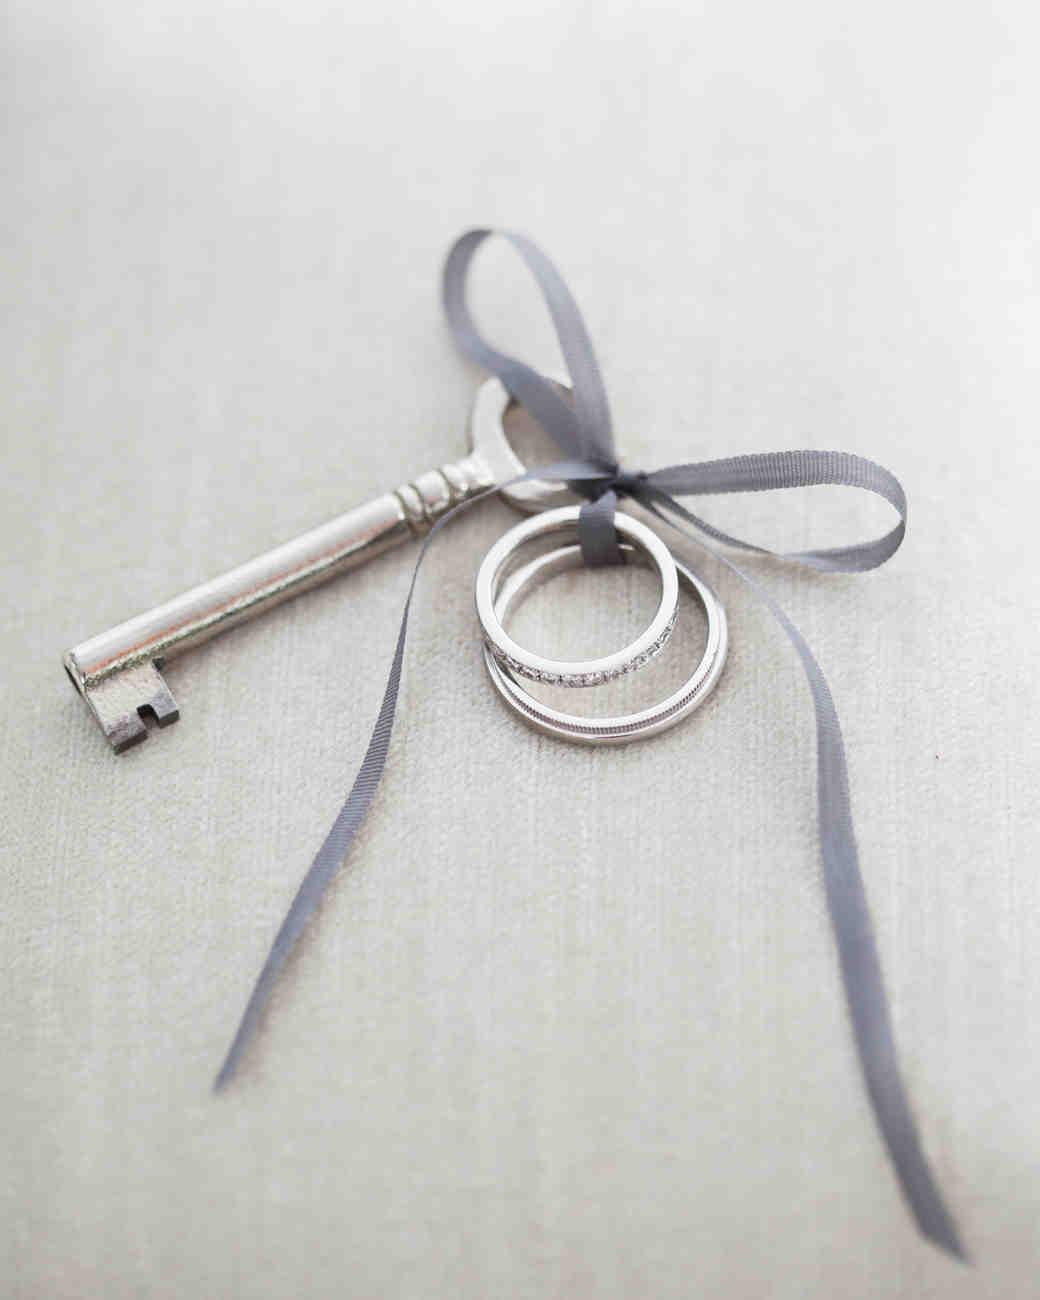 wedding-bands-on-house-key-2-mwd110629.jpg